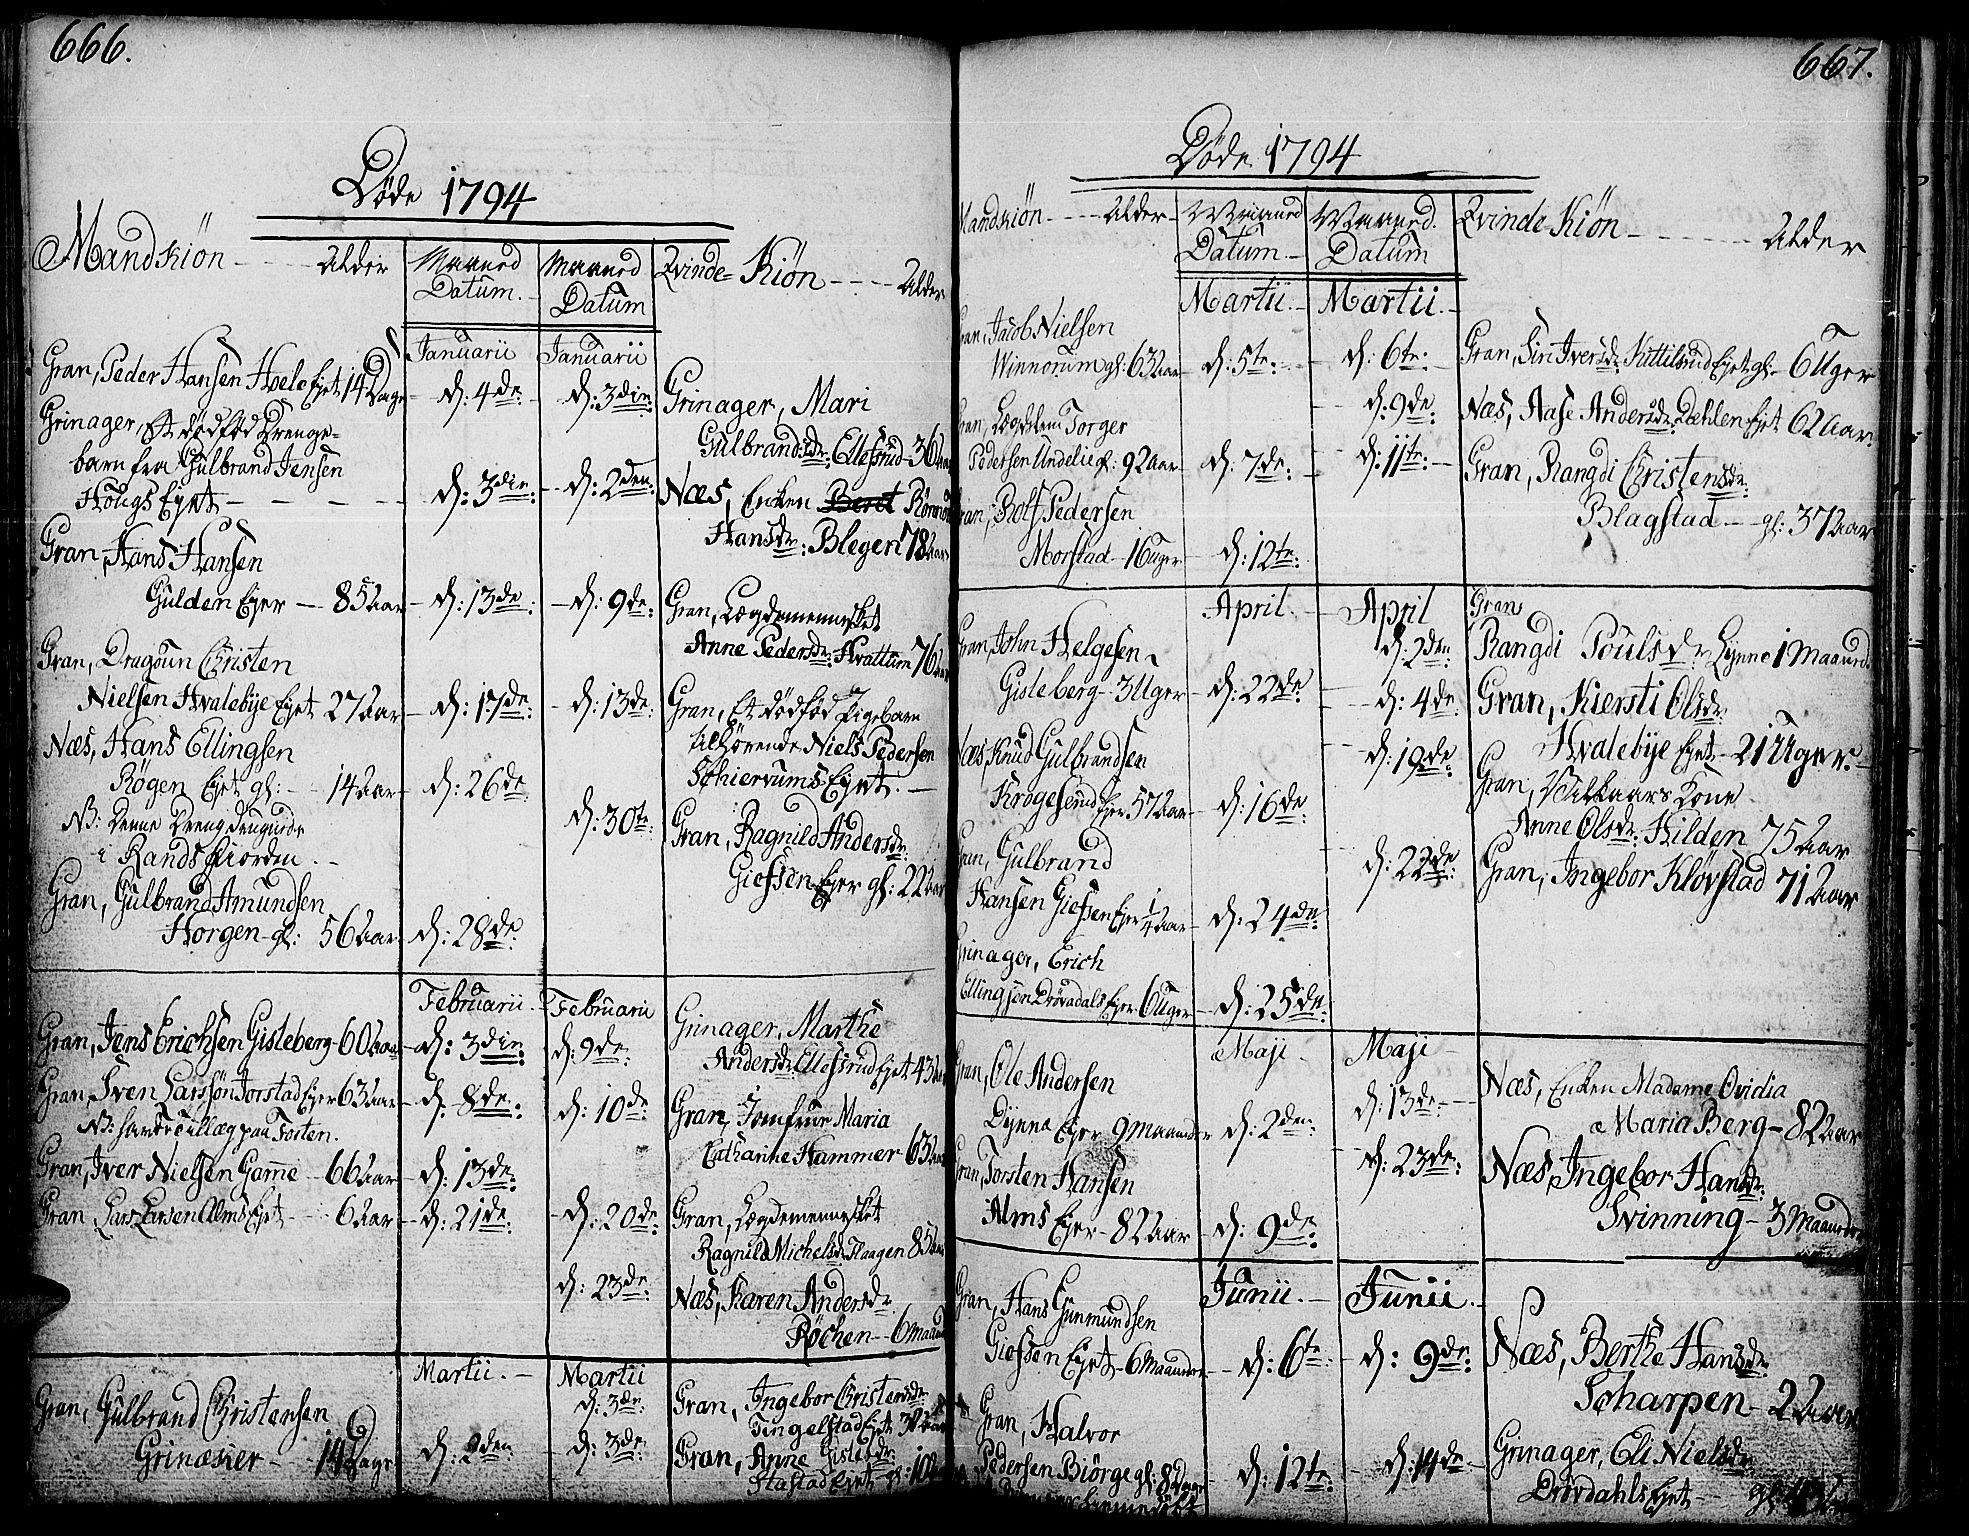 SAH, Gran prestekontor, Ministerialbok nr. 6, 1787-1824, s. 666-667